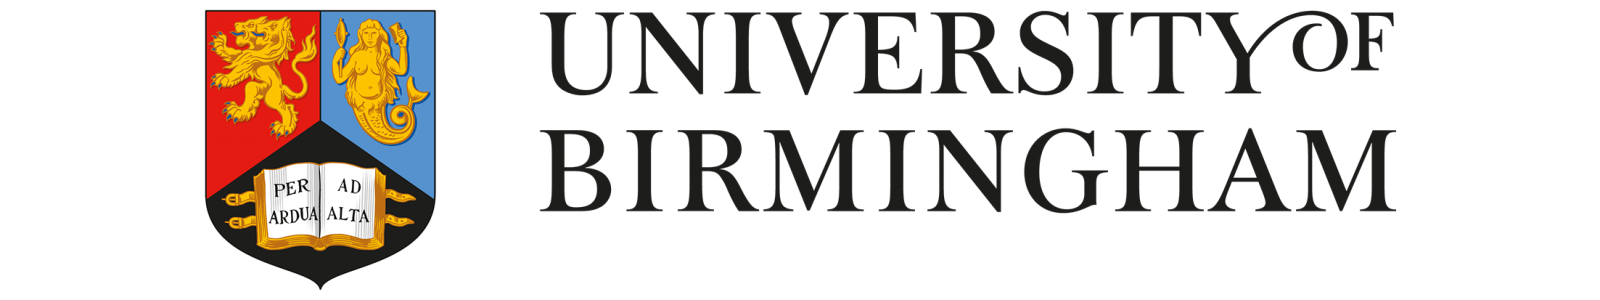 The University of Birmingham logo